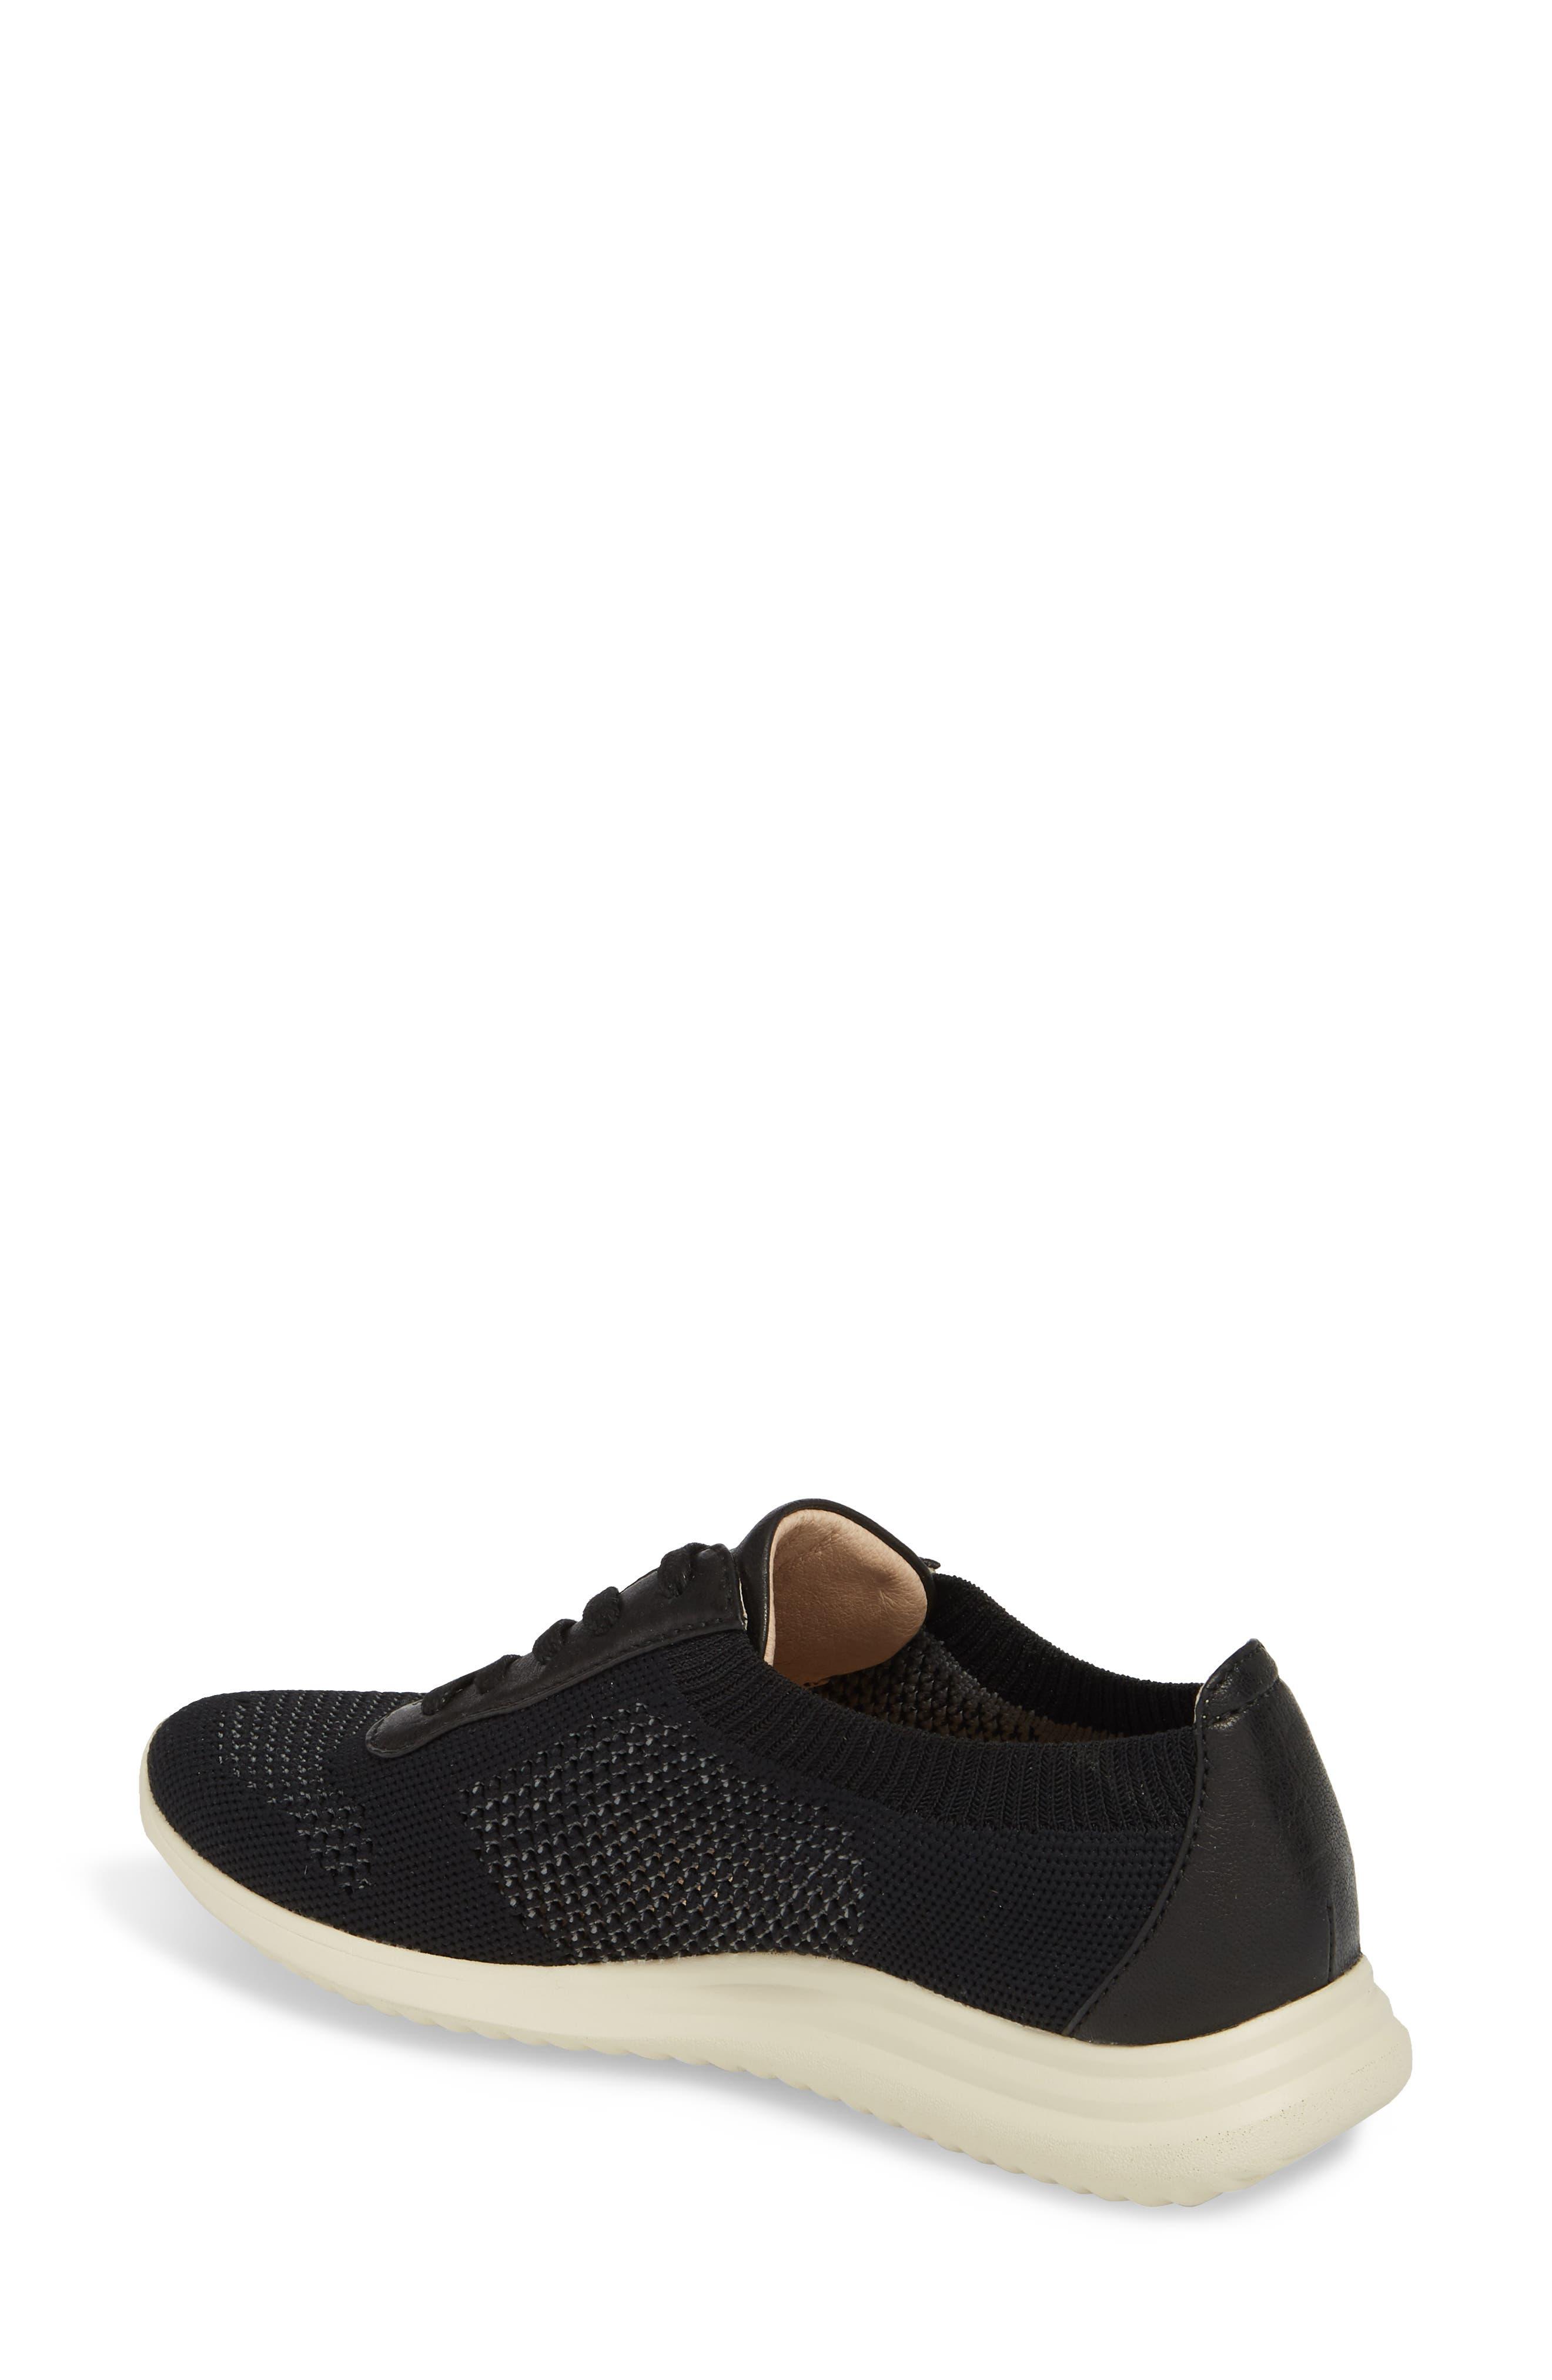 Novella Sneaker,                             Alternate thumbnail 2, color,                             001